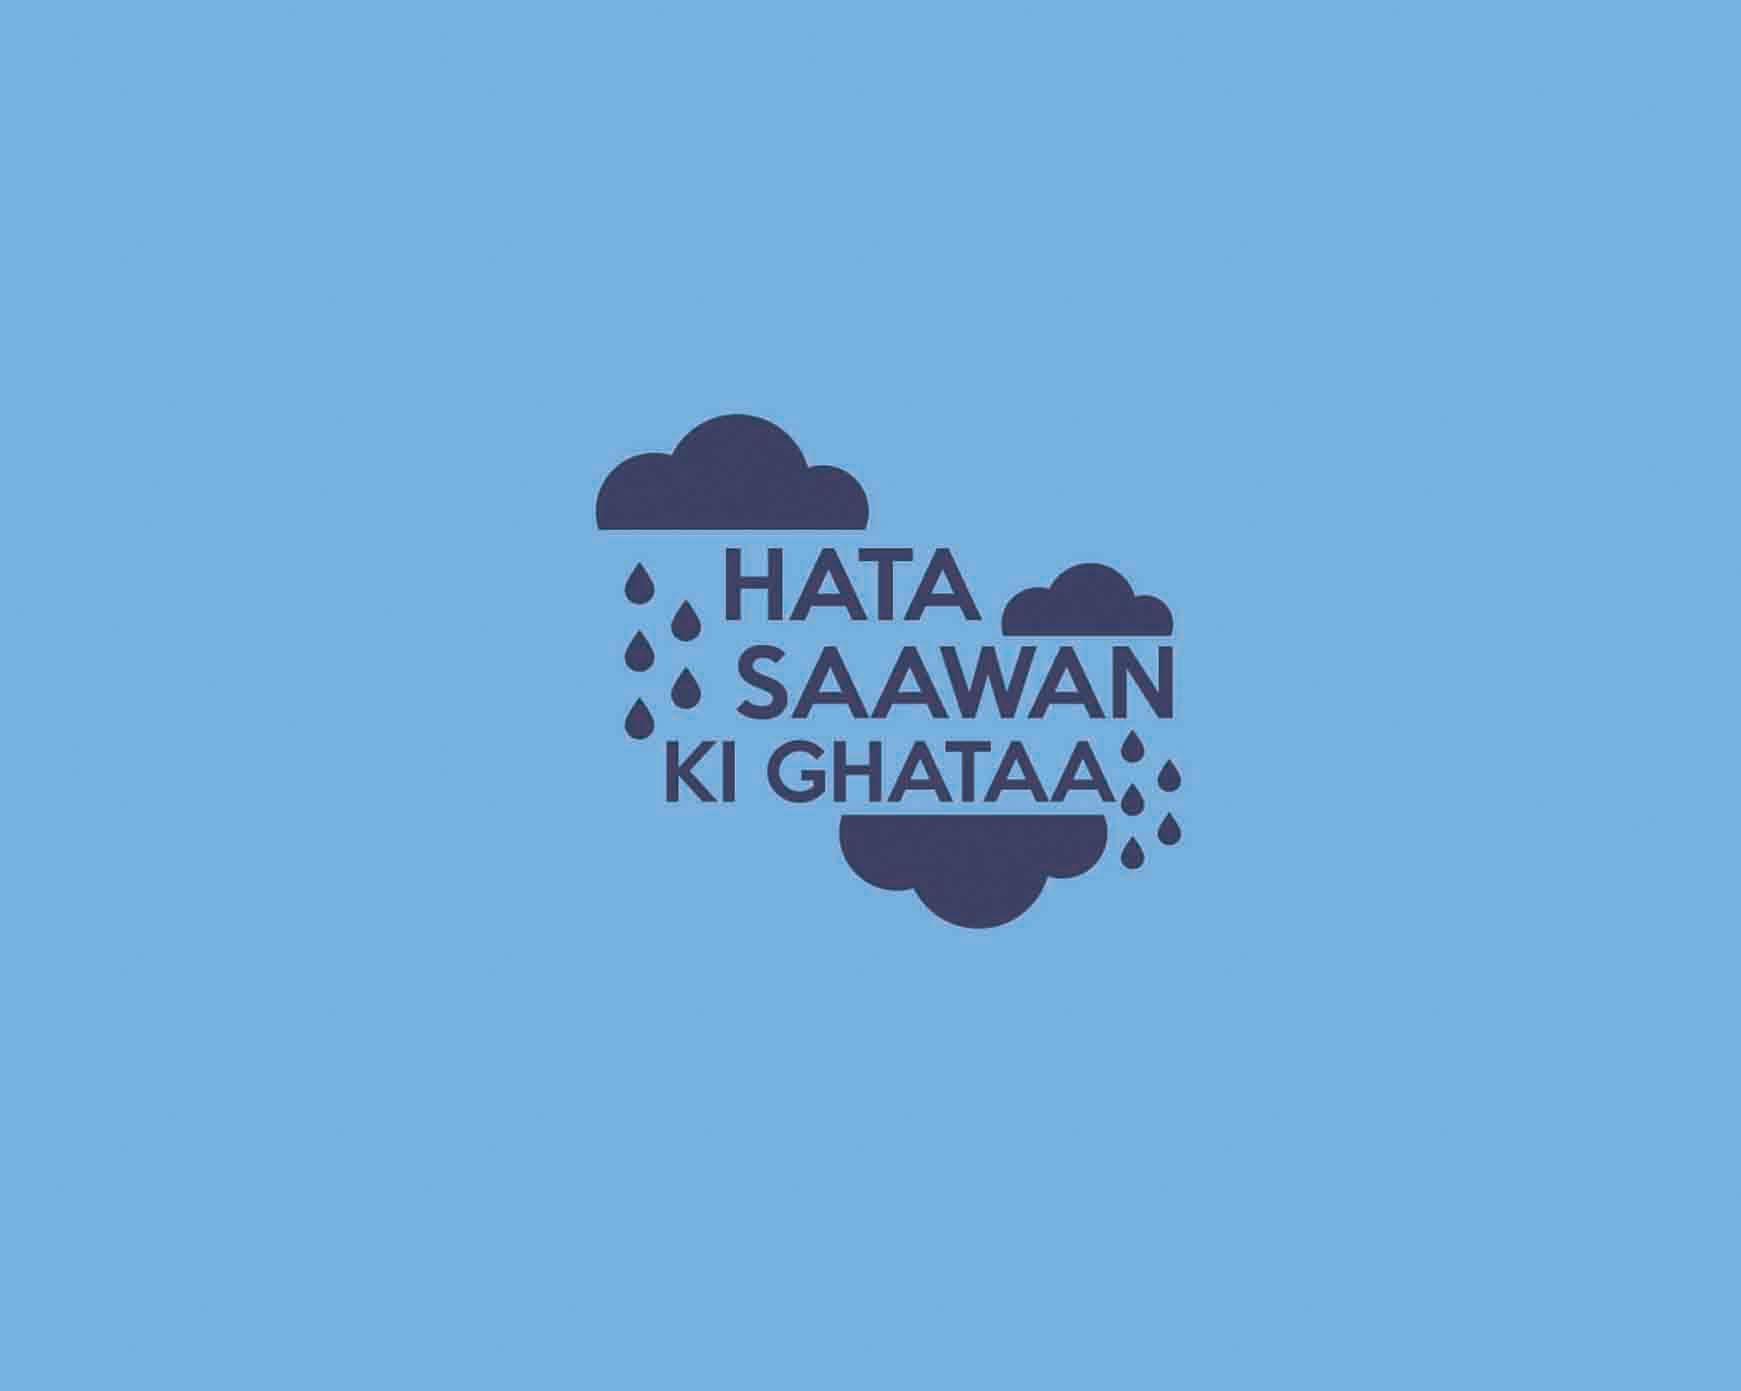 SAAWAN-KI-GHATAA